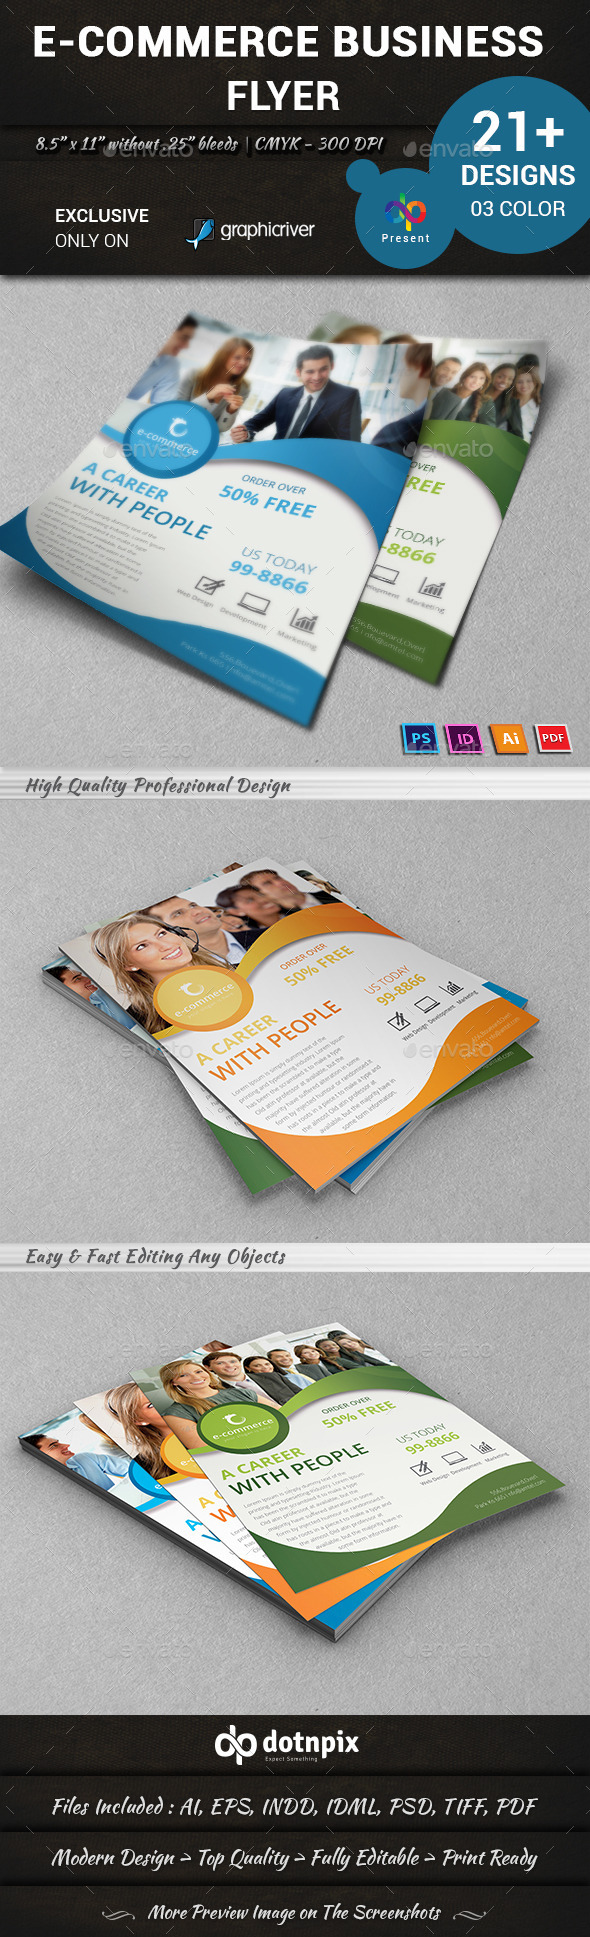 GraphicRiver E-Commerce Business Flyer 10873467